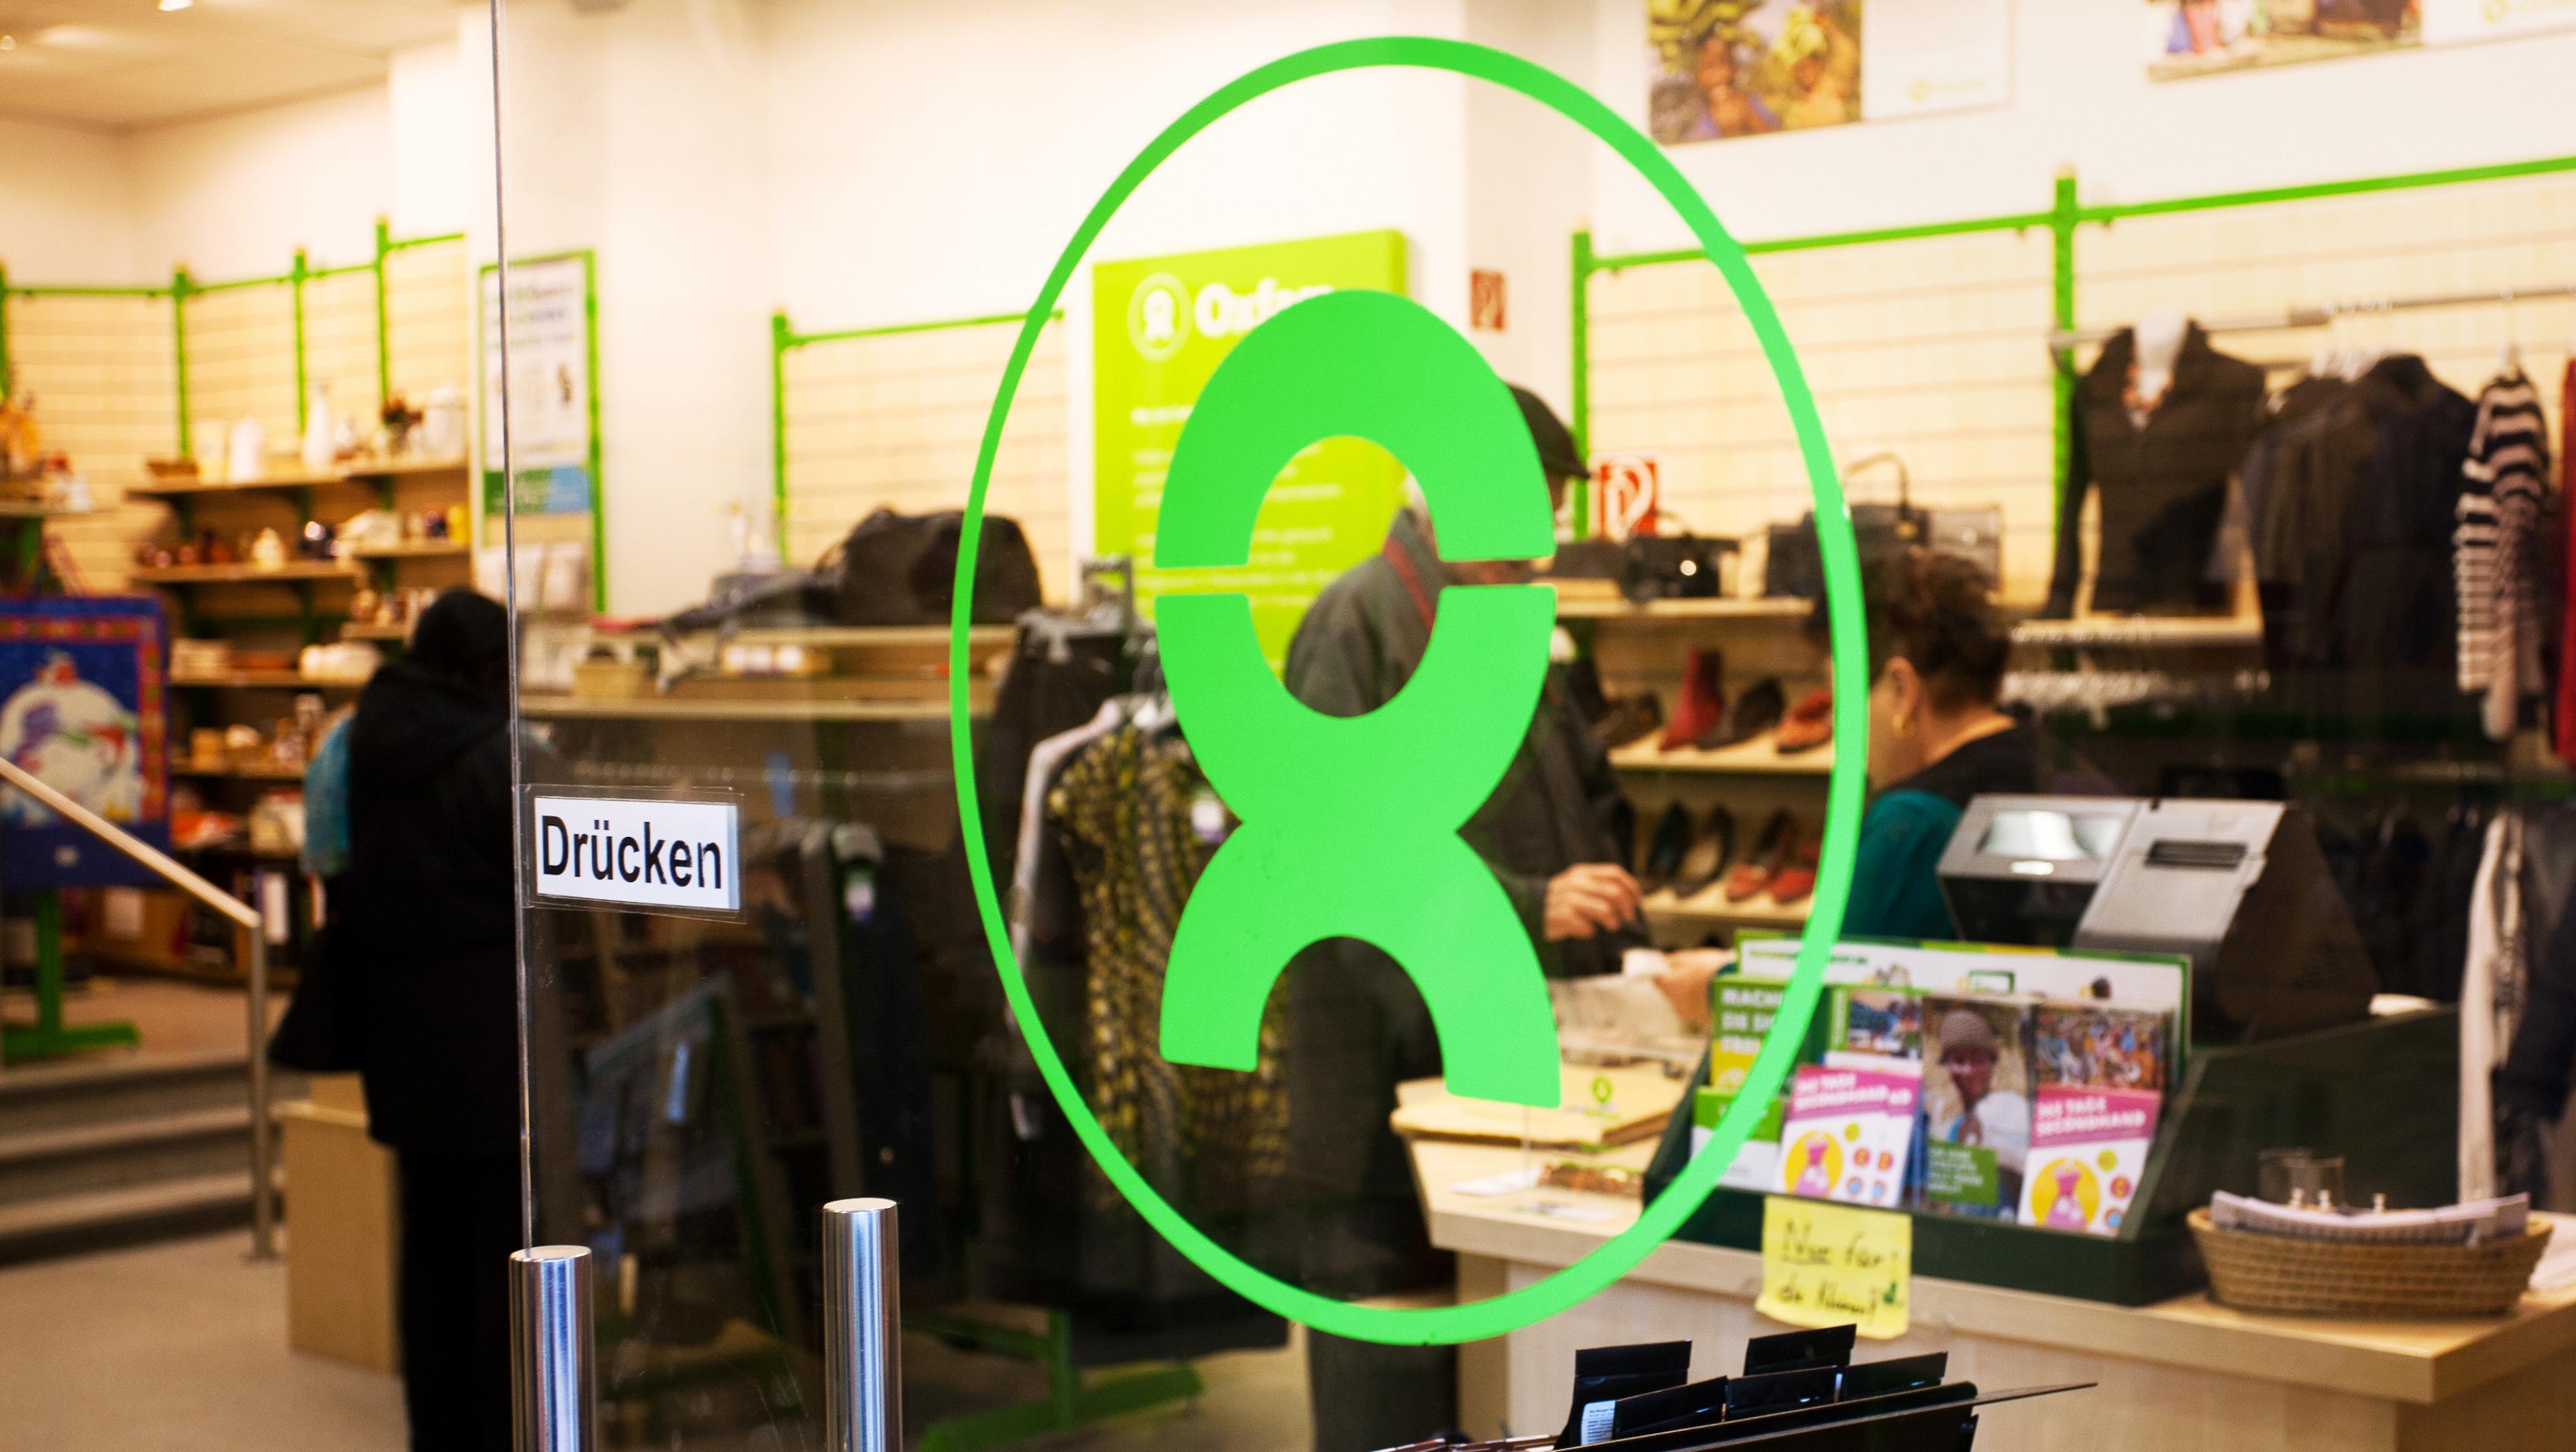 Oxfam Shop Berlin-Schöneberg - Eingang